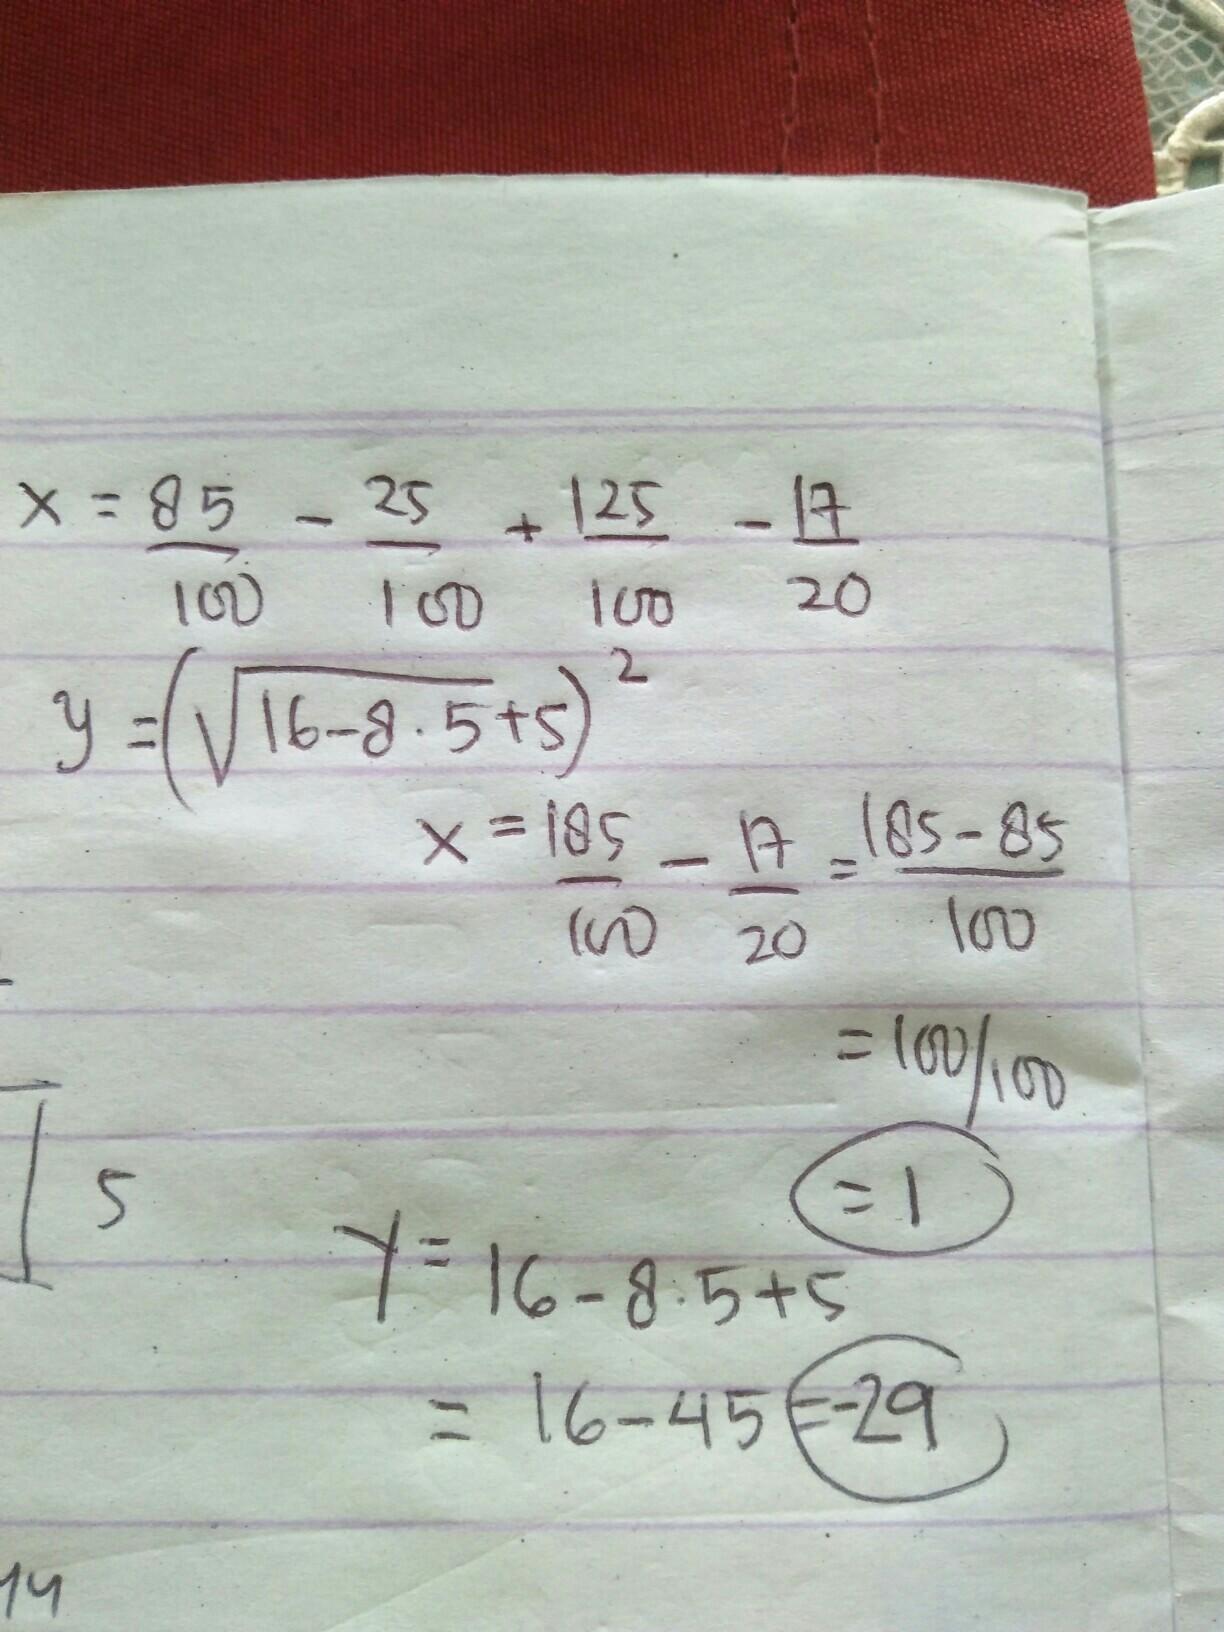 Jika x = 85% - 25% + 1,25 - 17/20 dan y akar dari 16 - 8 x ...